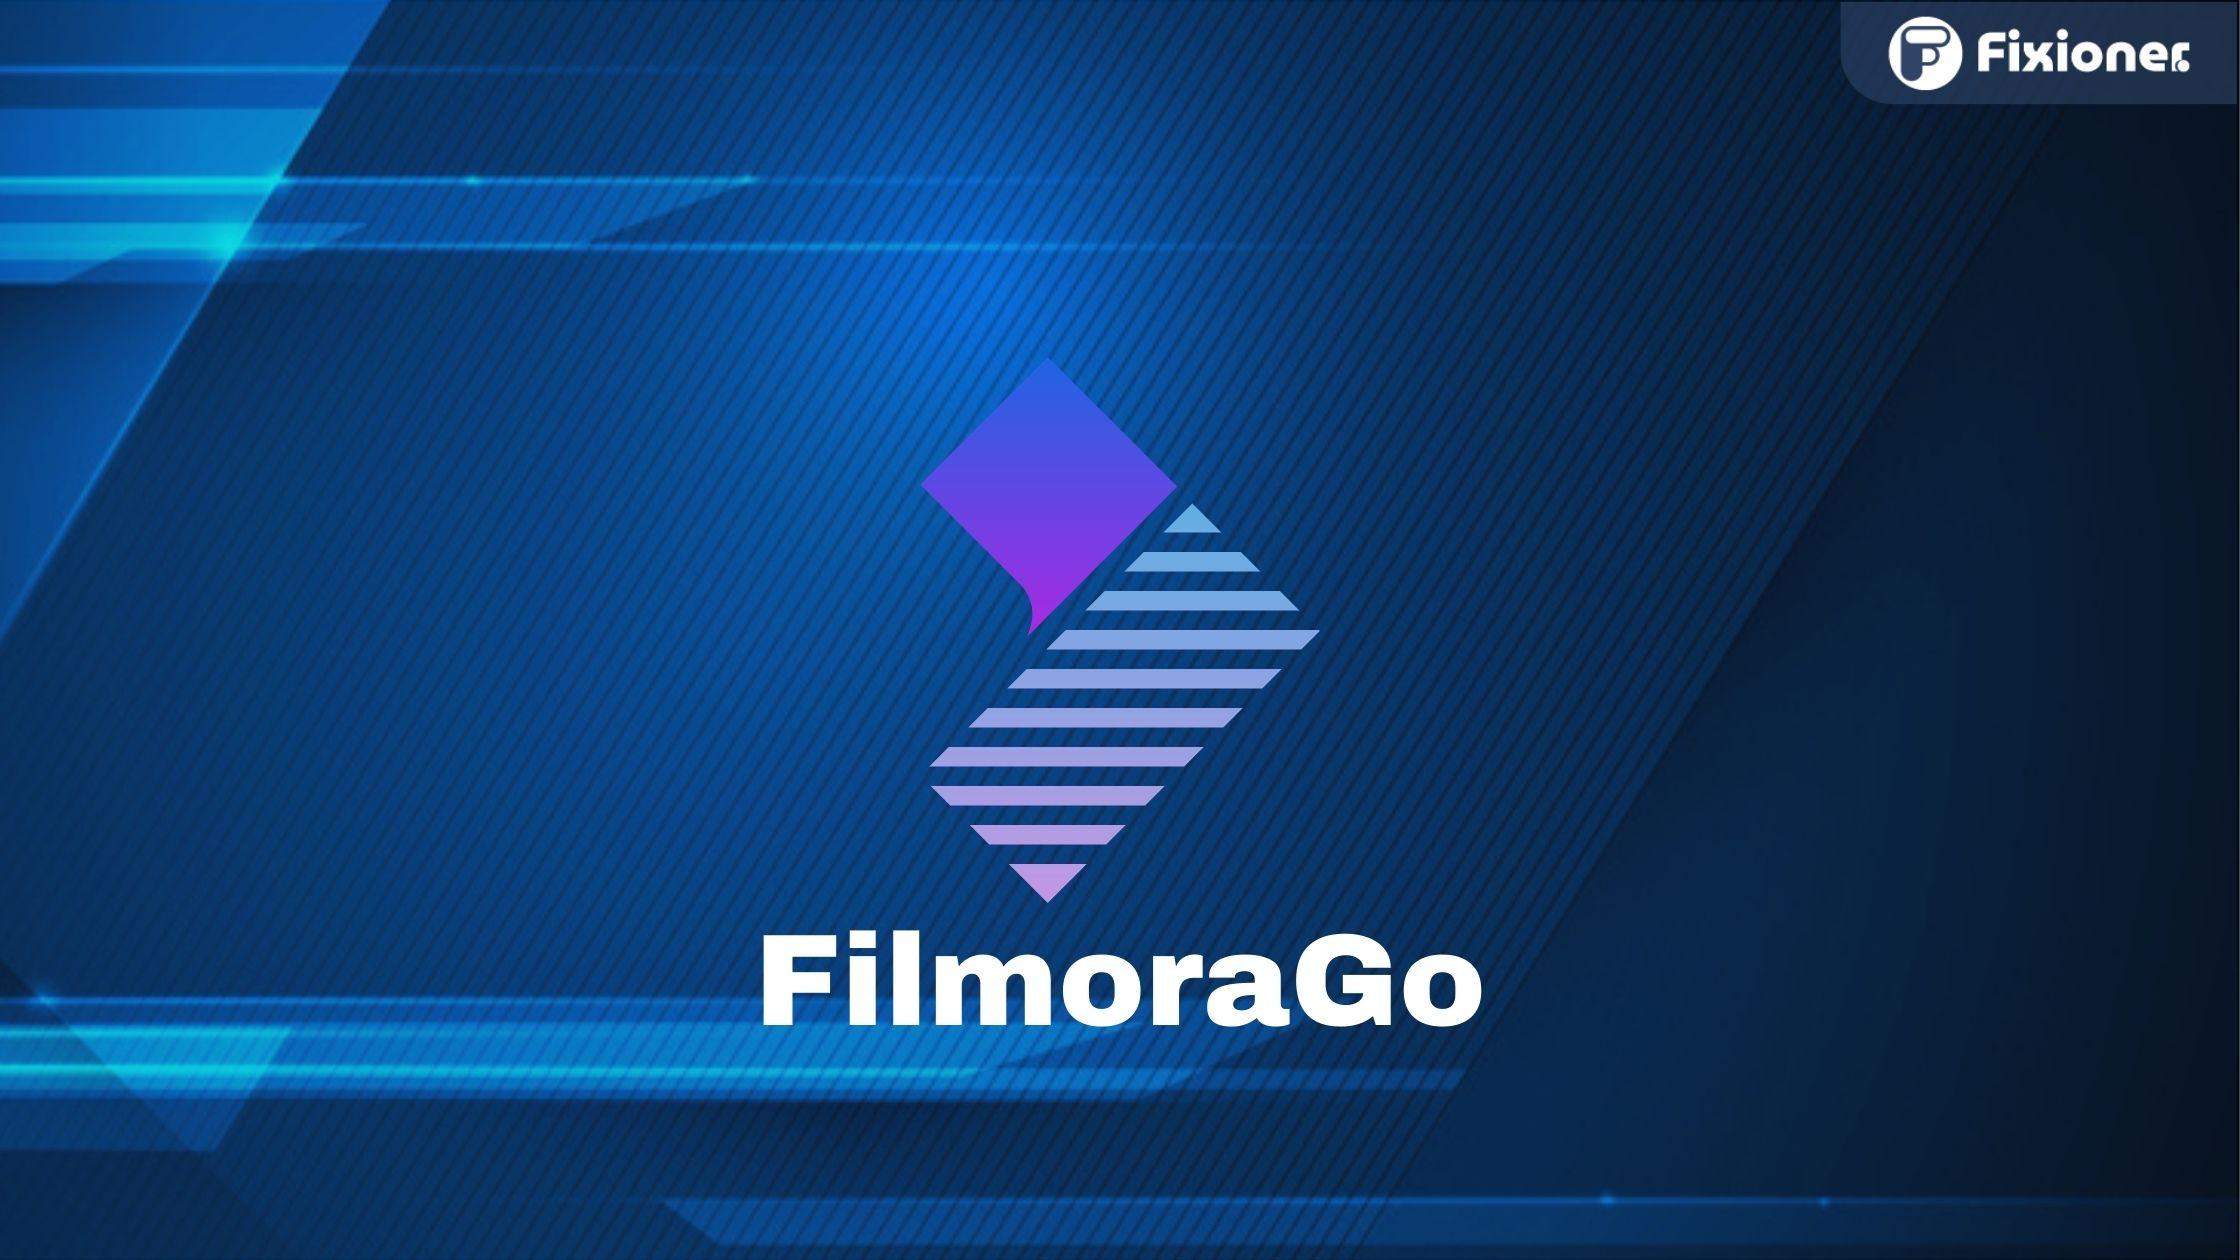 FilmoraGo Pro Mod: Aplikasi Edit Video, Gratis dan Terbaru 2021